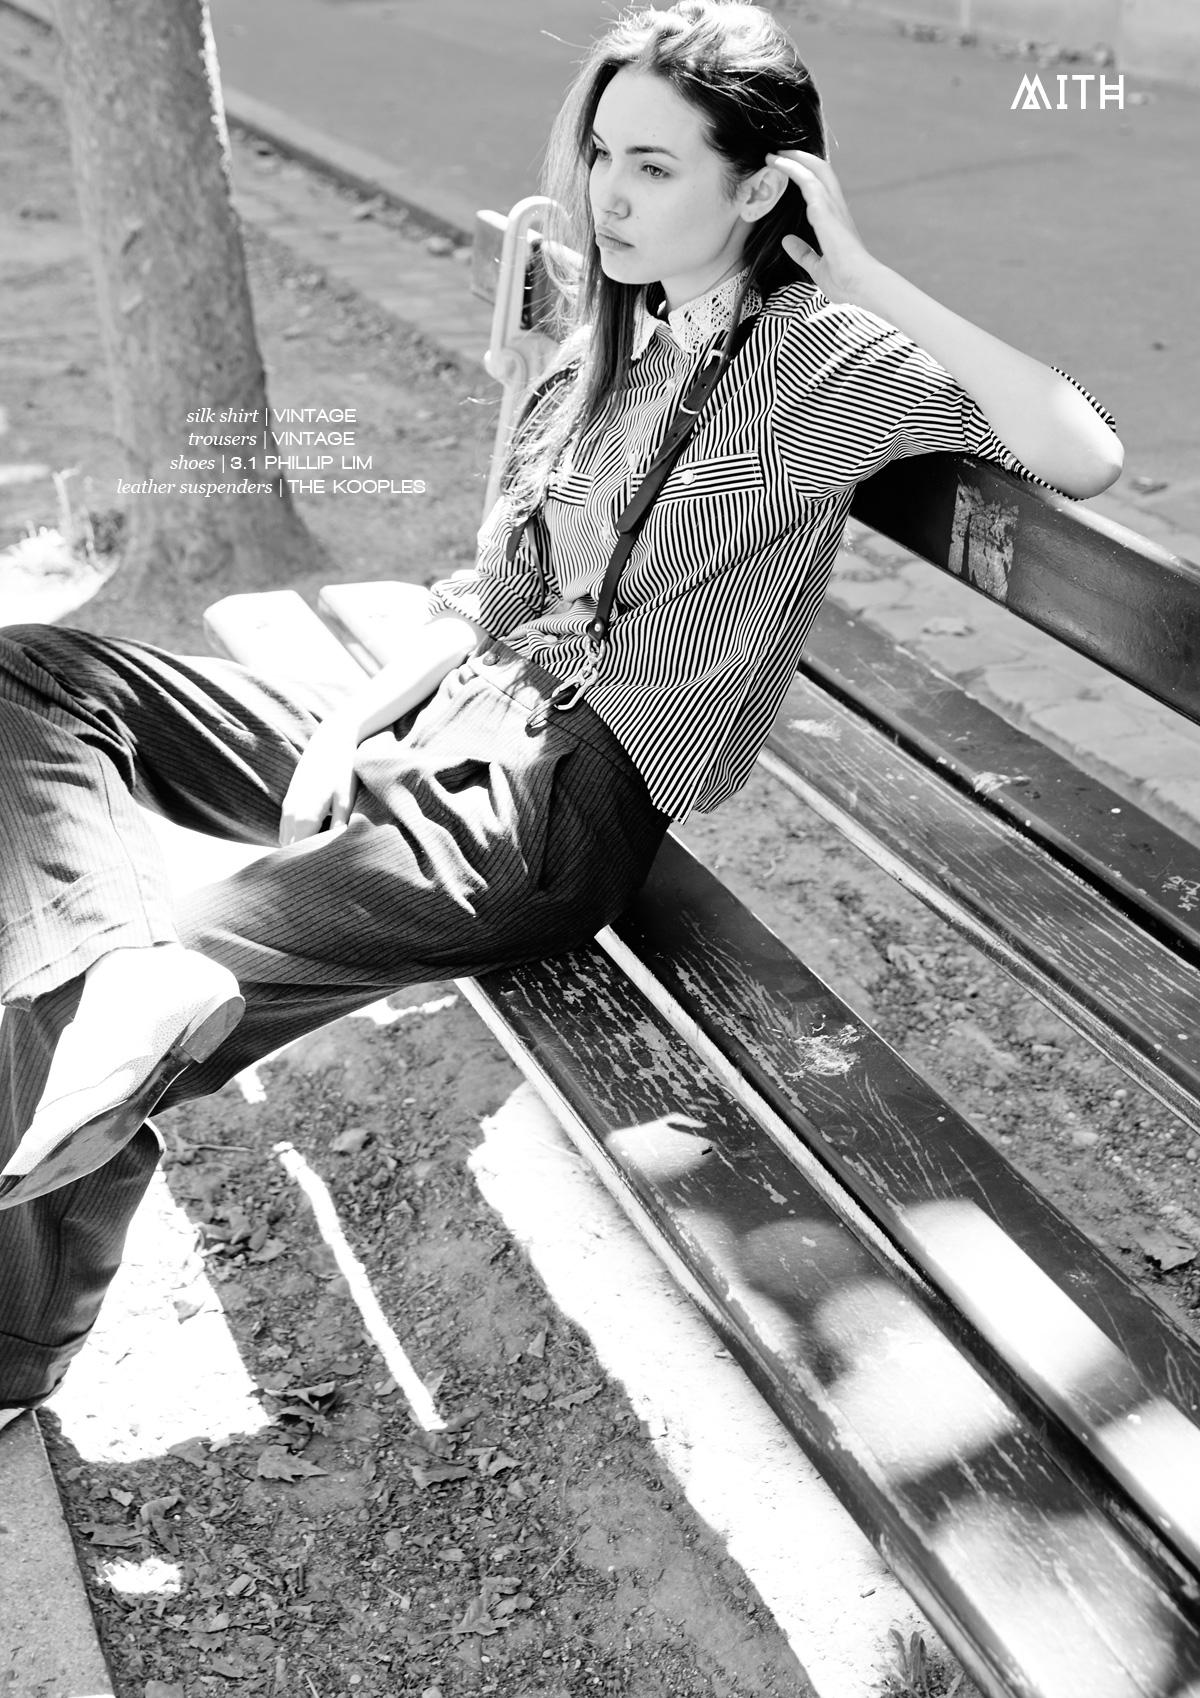 MITH Fashion Editorial - Time for School :: Margaux Brazhnyk @ Star System Models by Nicolas Le Forestier